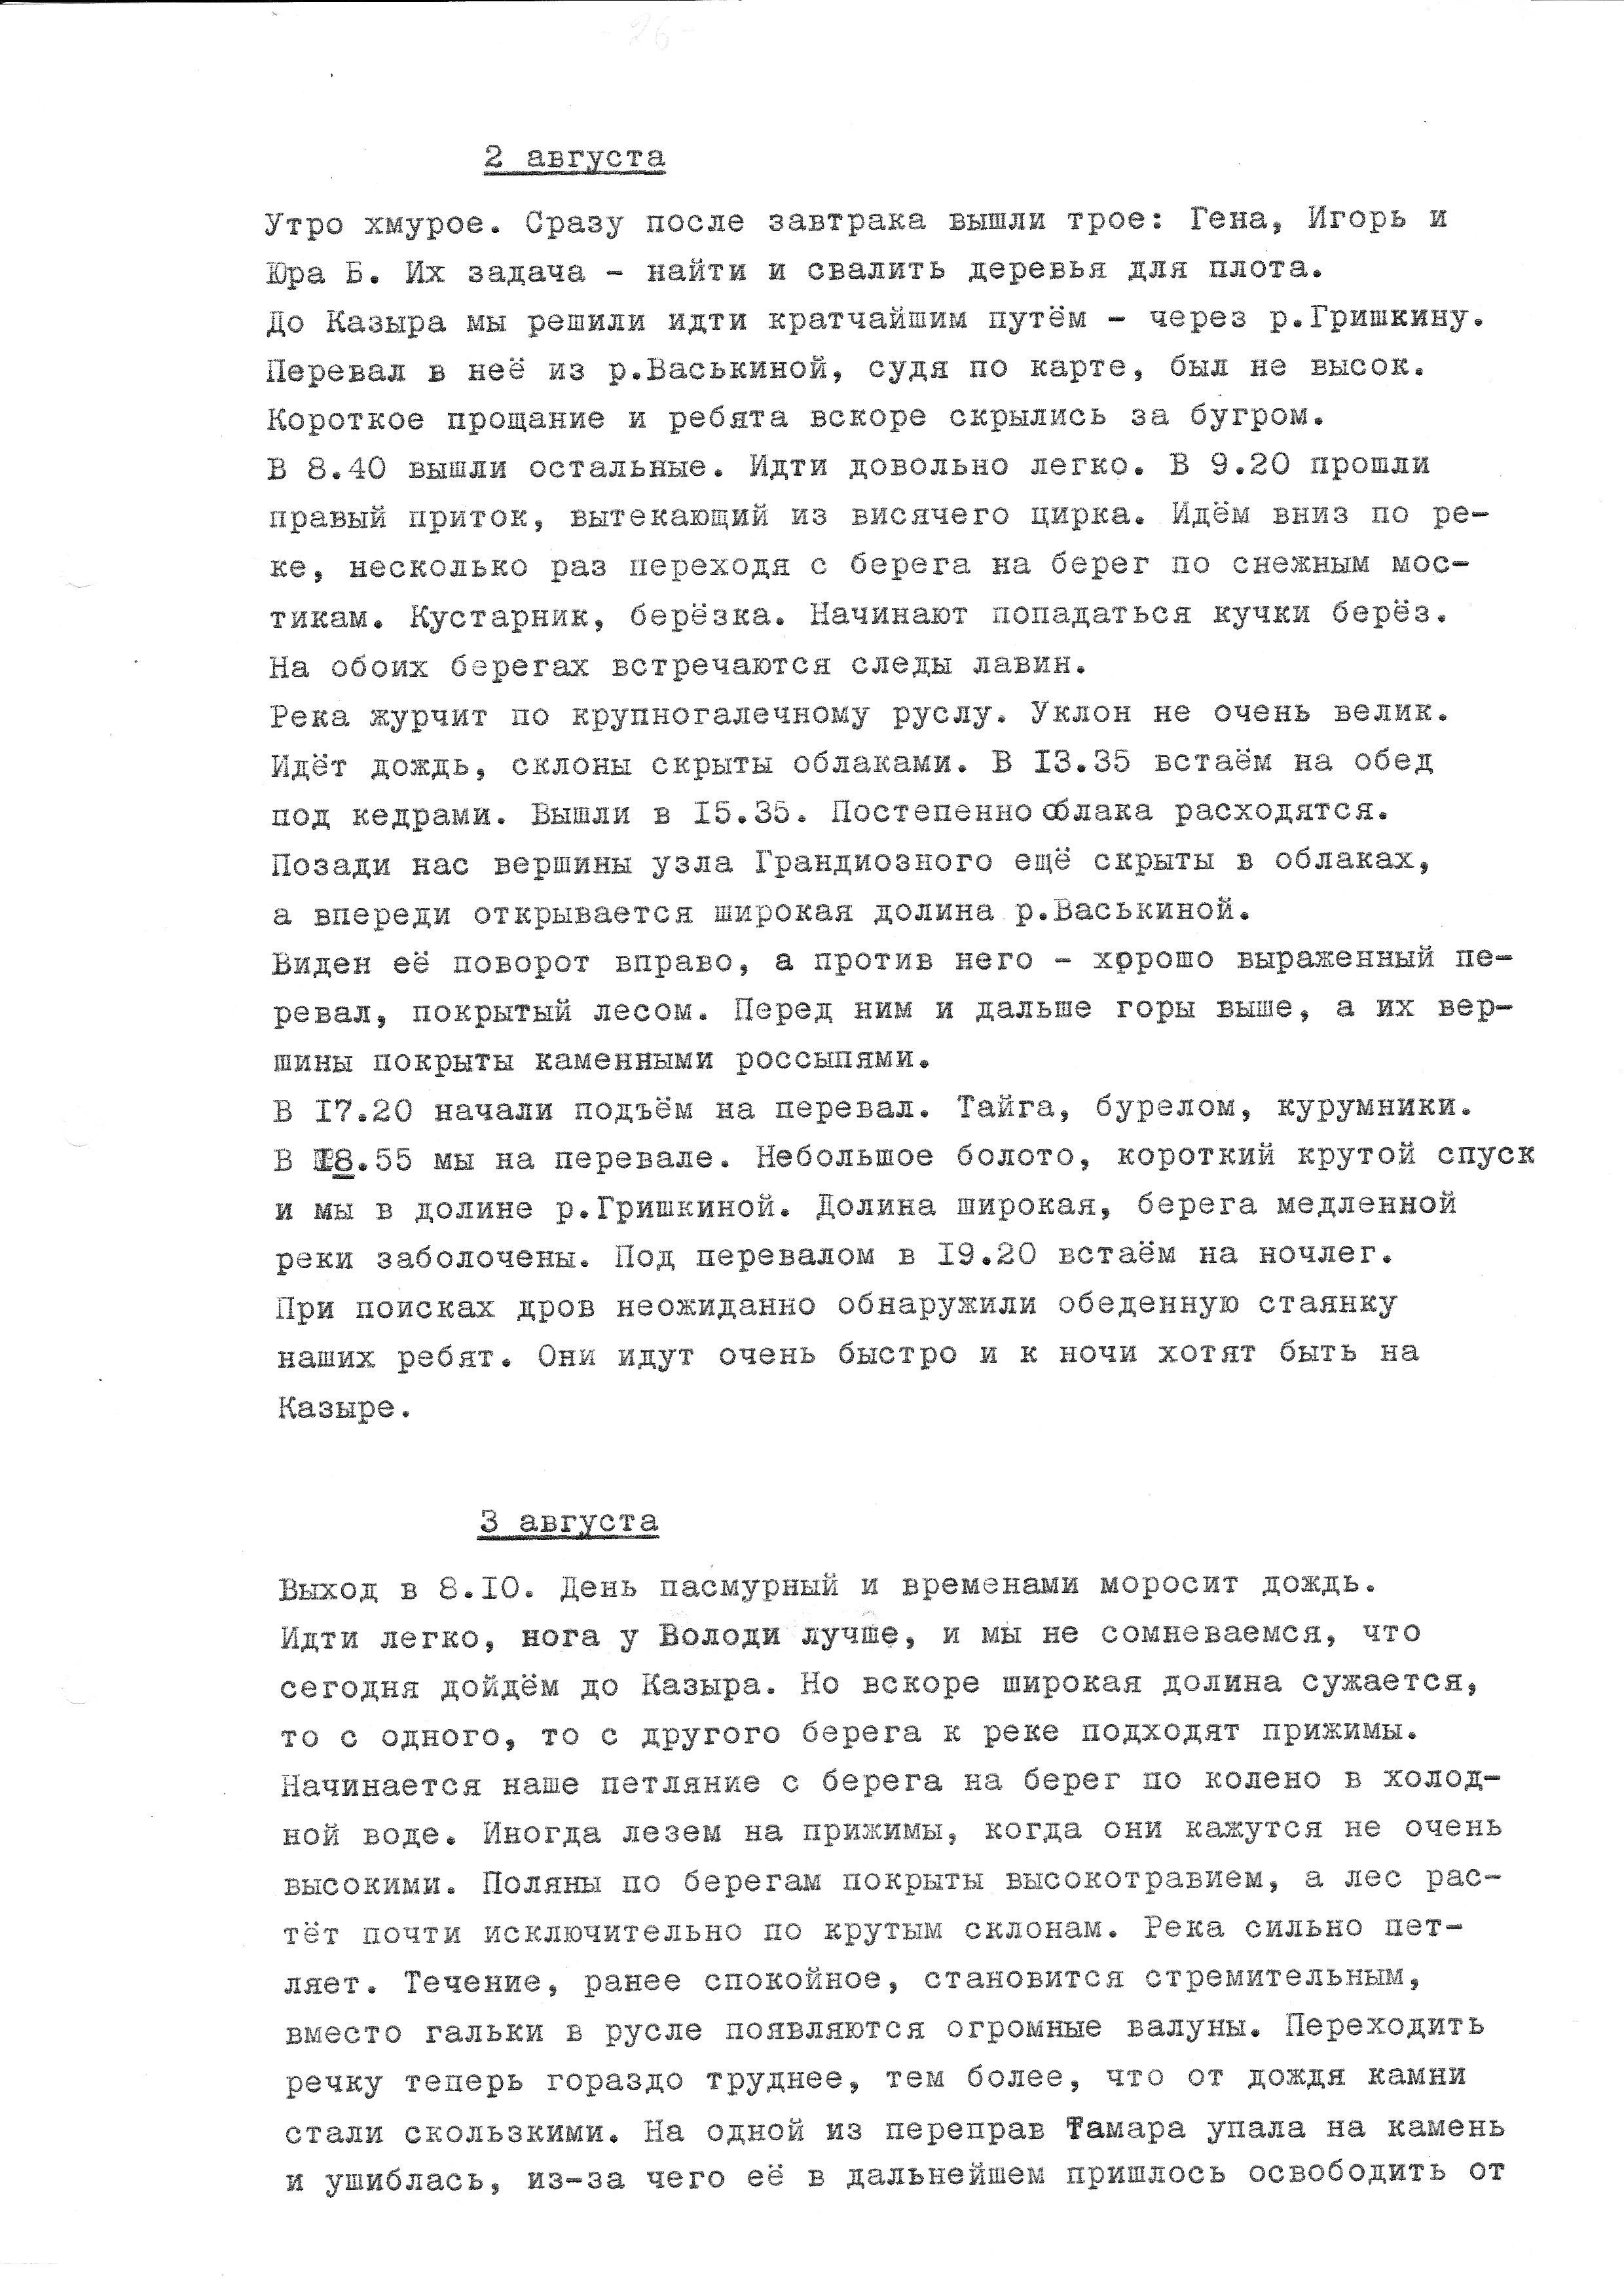 https://img-fotki.yandex.ru/get/6826/164520479.7d/0_e48c9_d6a29797_orig.jpg